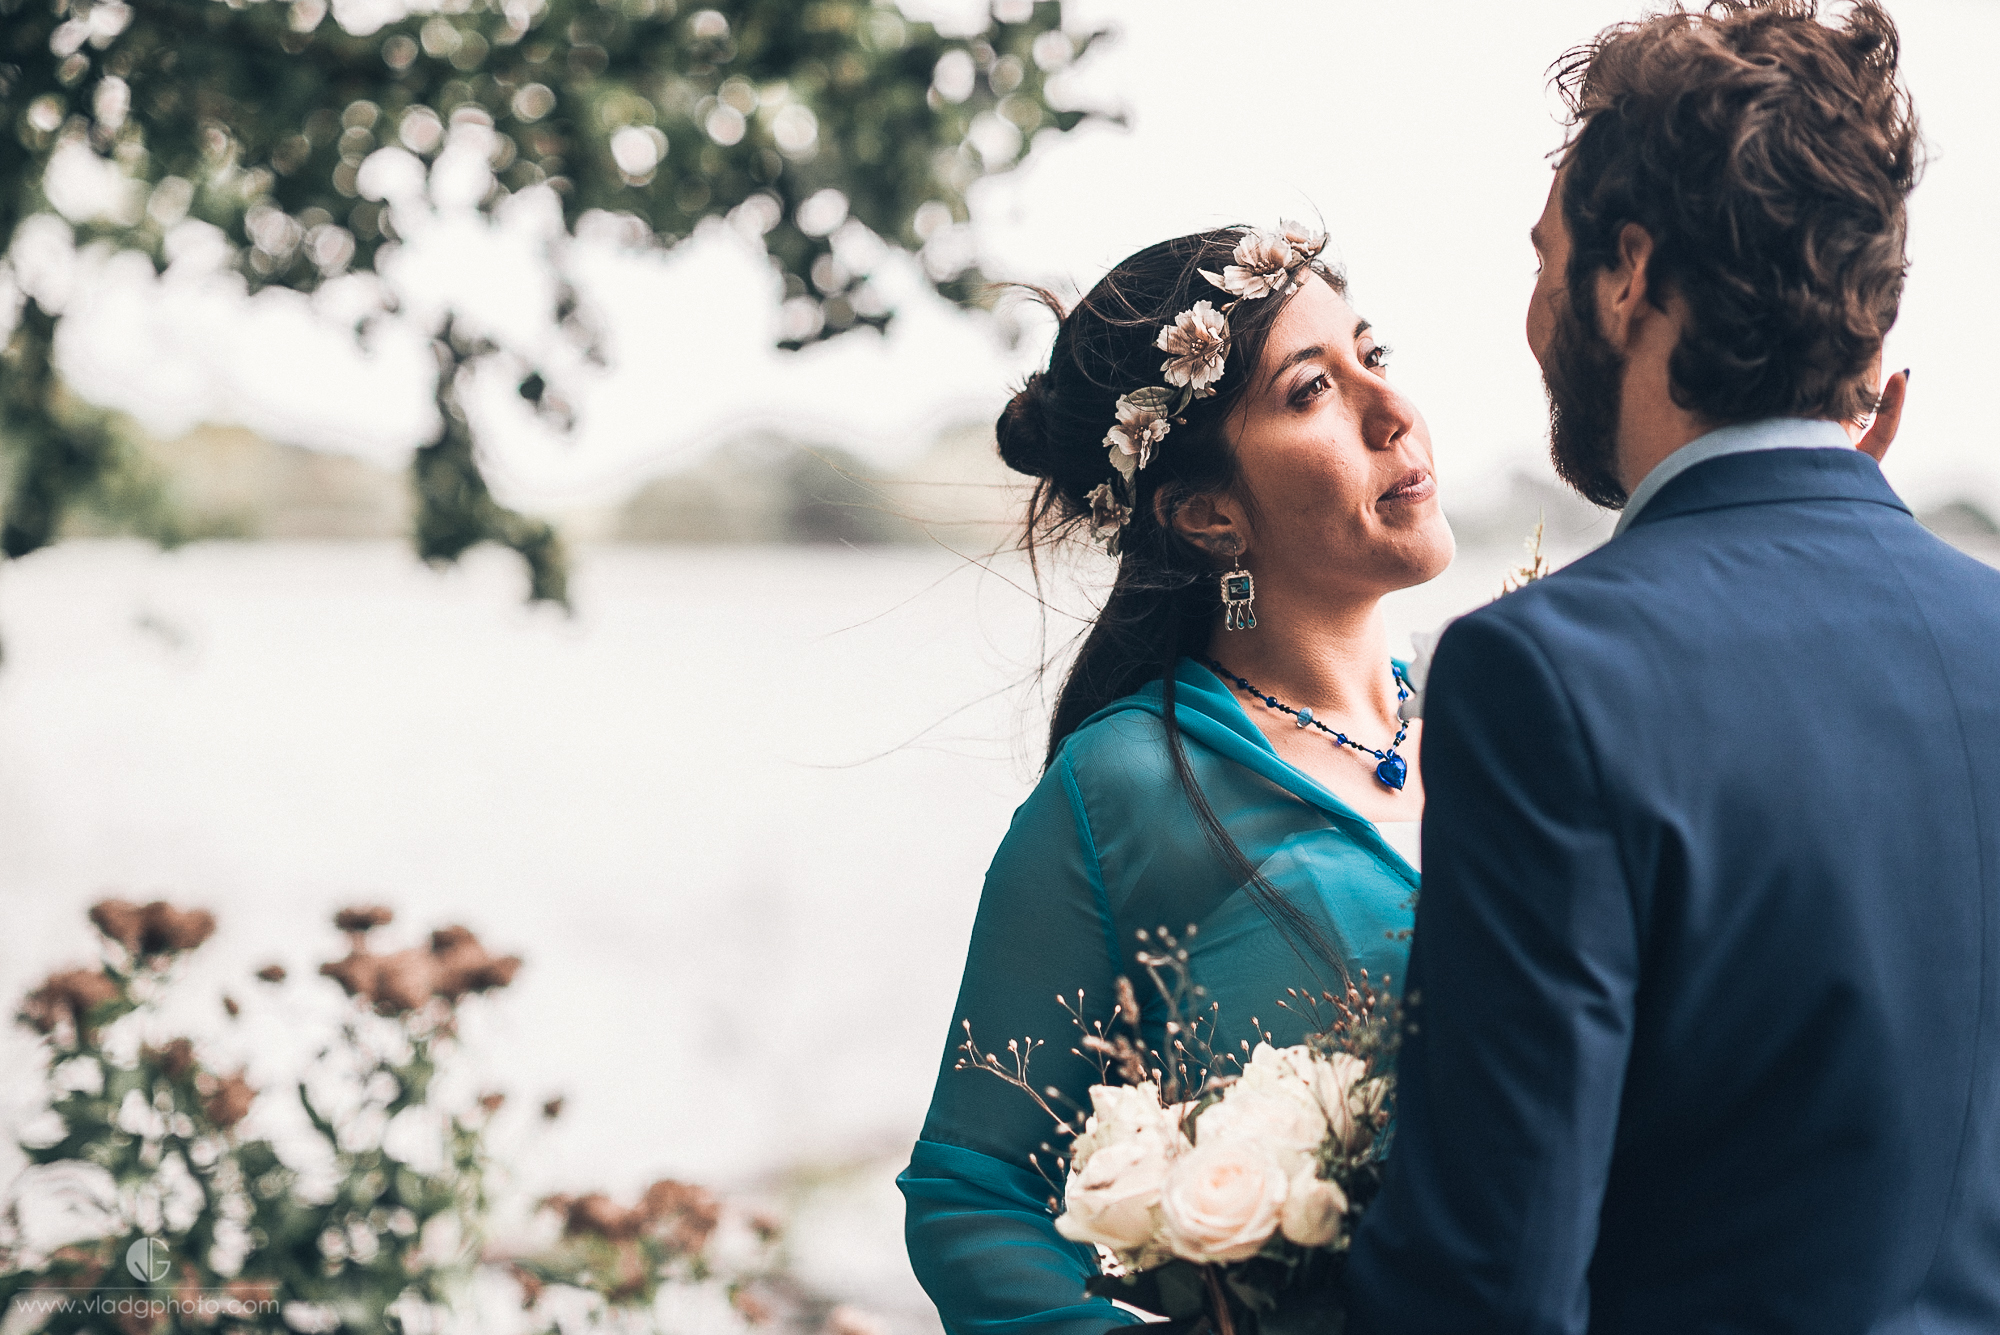 Lake Esrum Wedding Photography Denmark_8.jpg